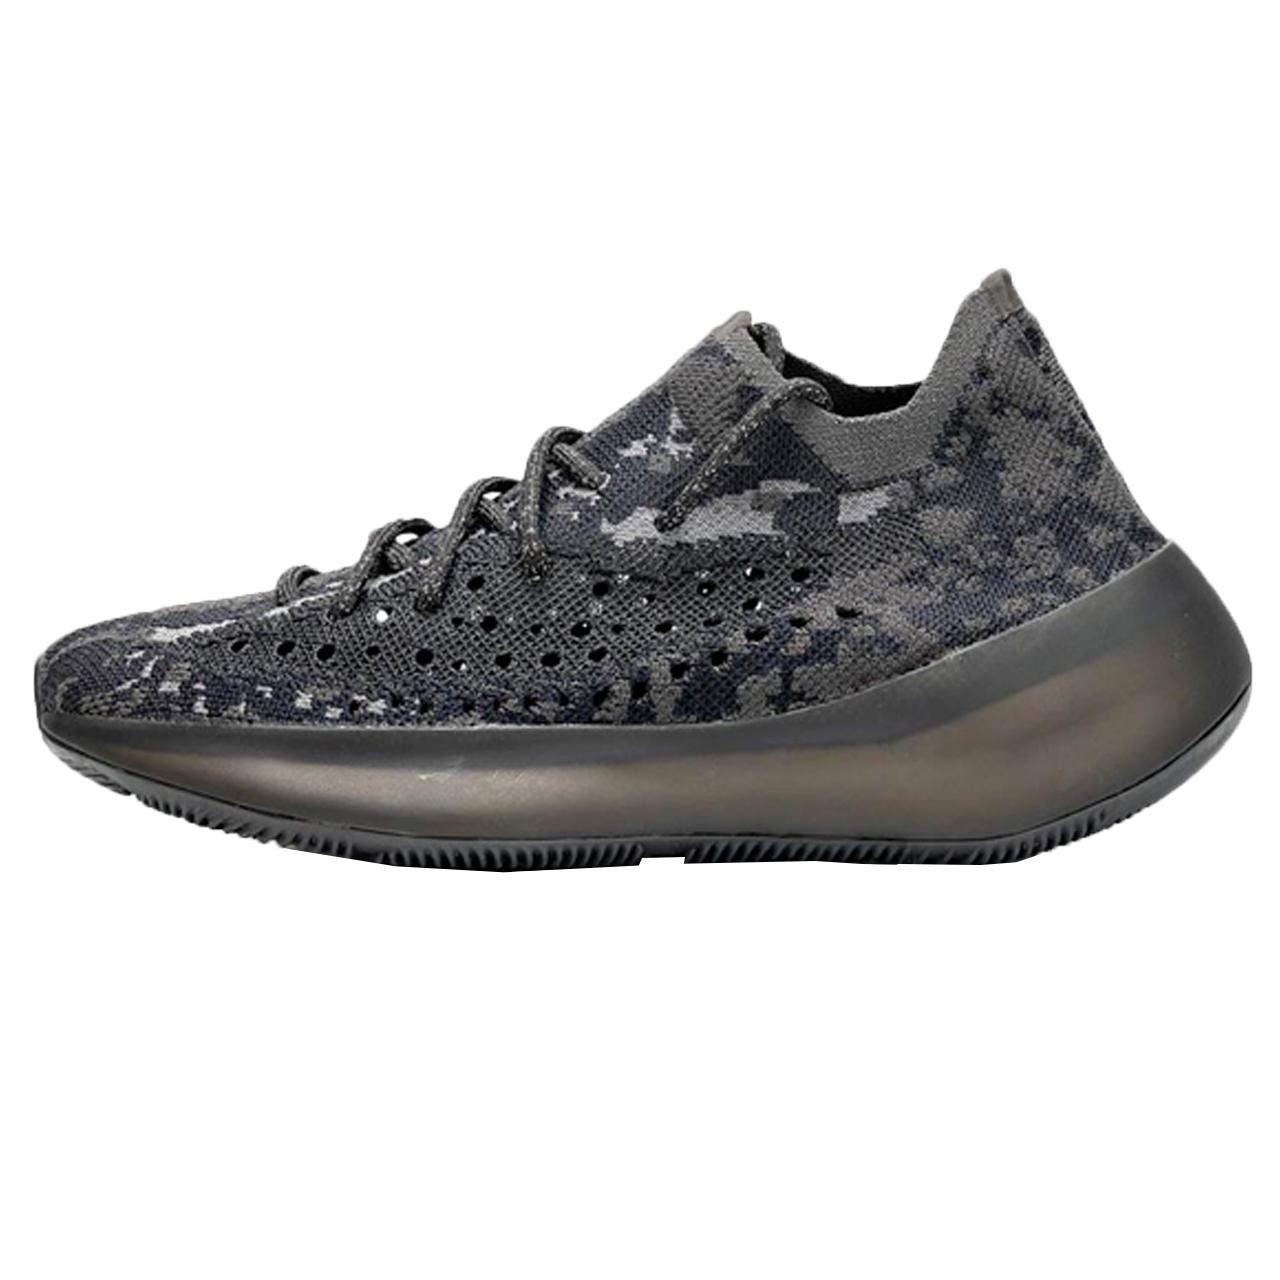 کفش مخصوص دویدن زنانه آدیداس مدل Yeezy 350 کد 6354-983